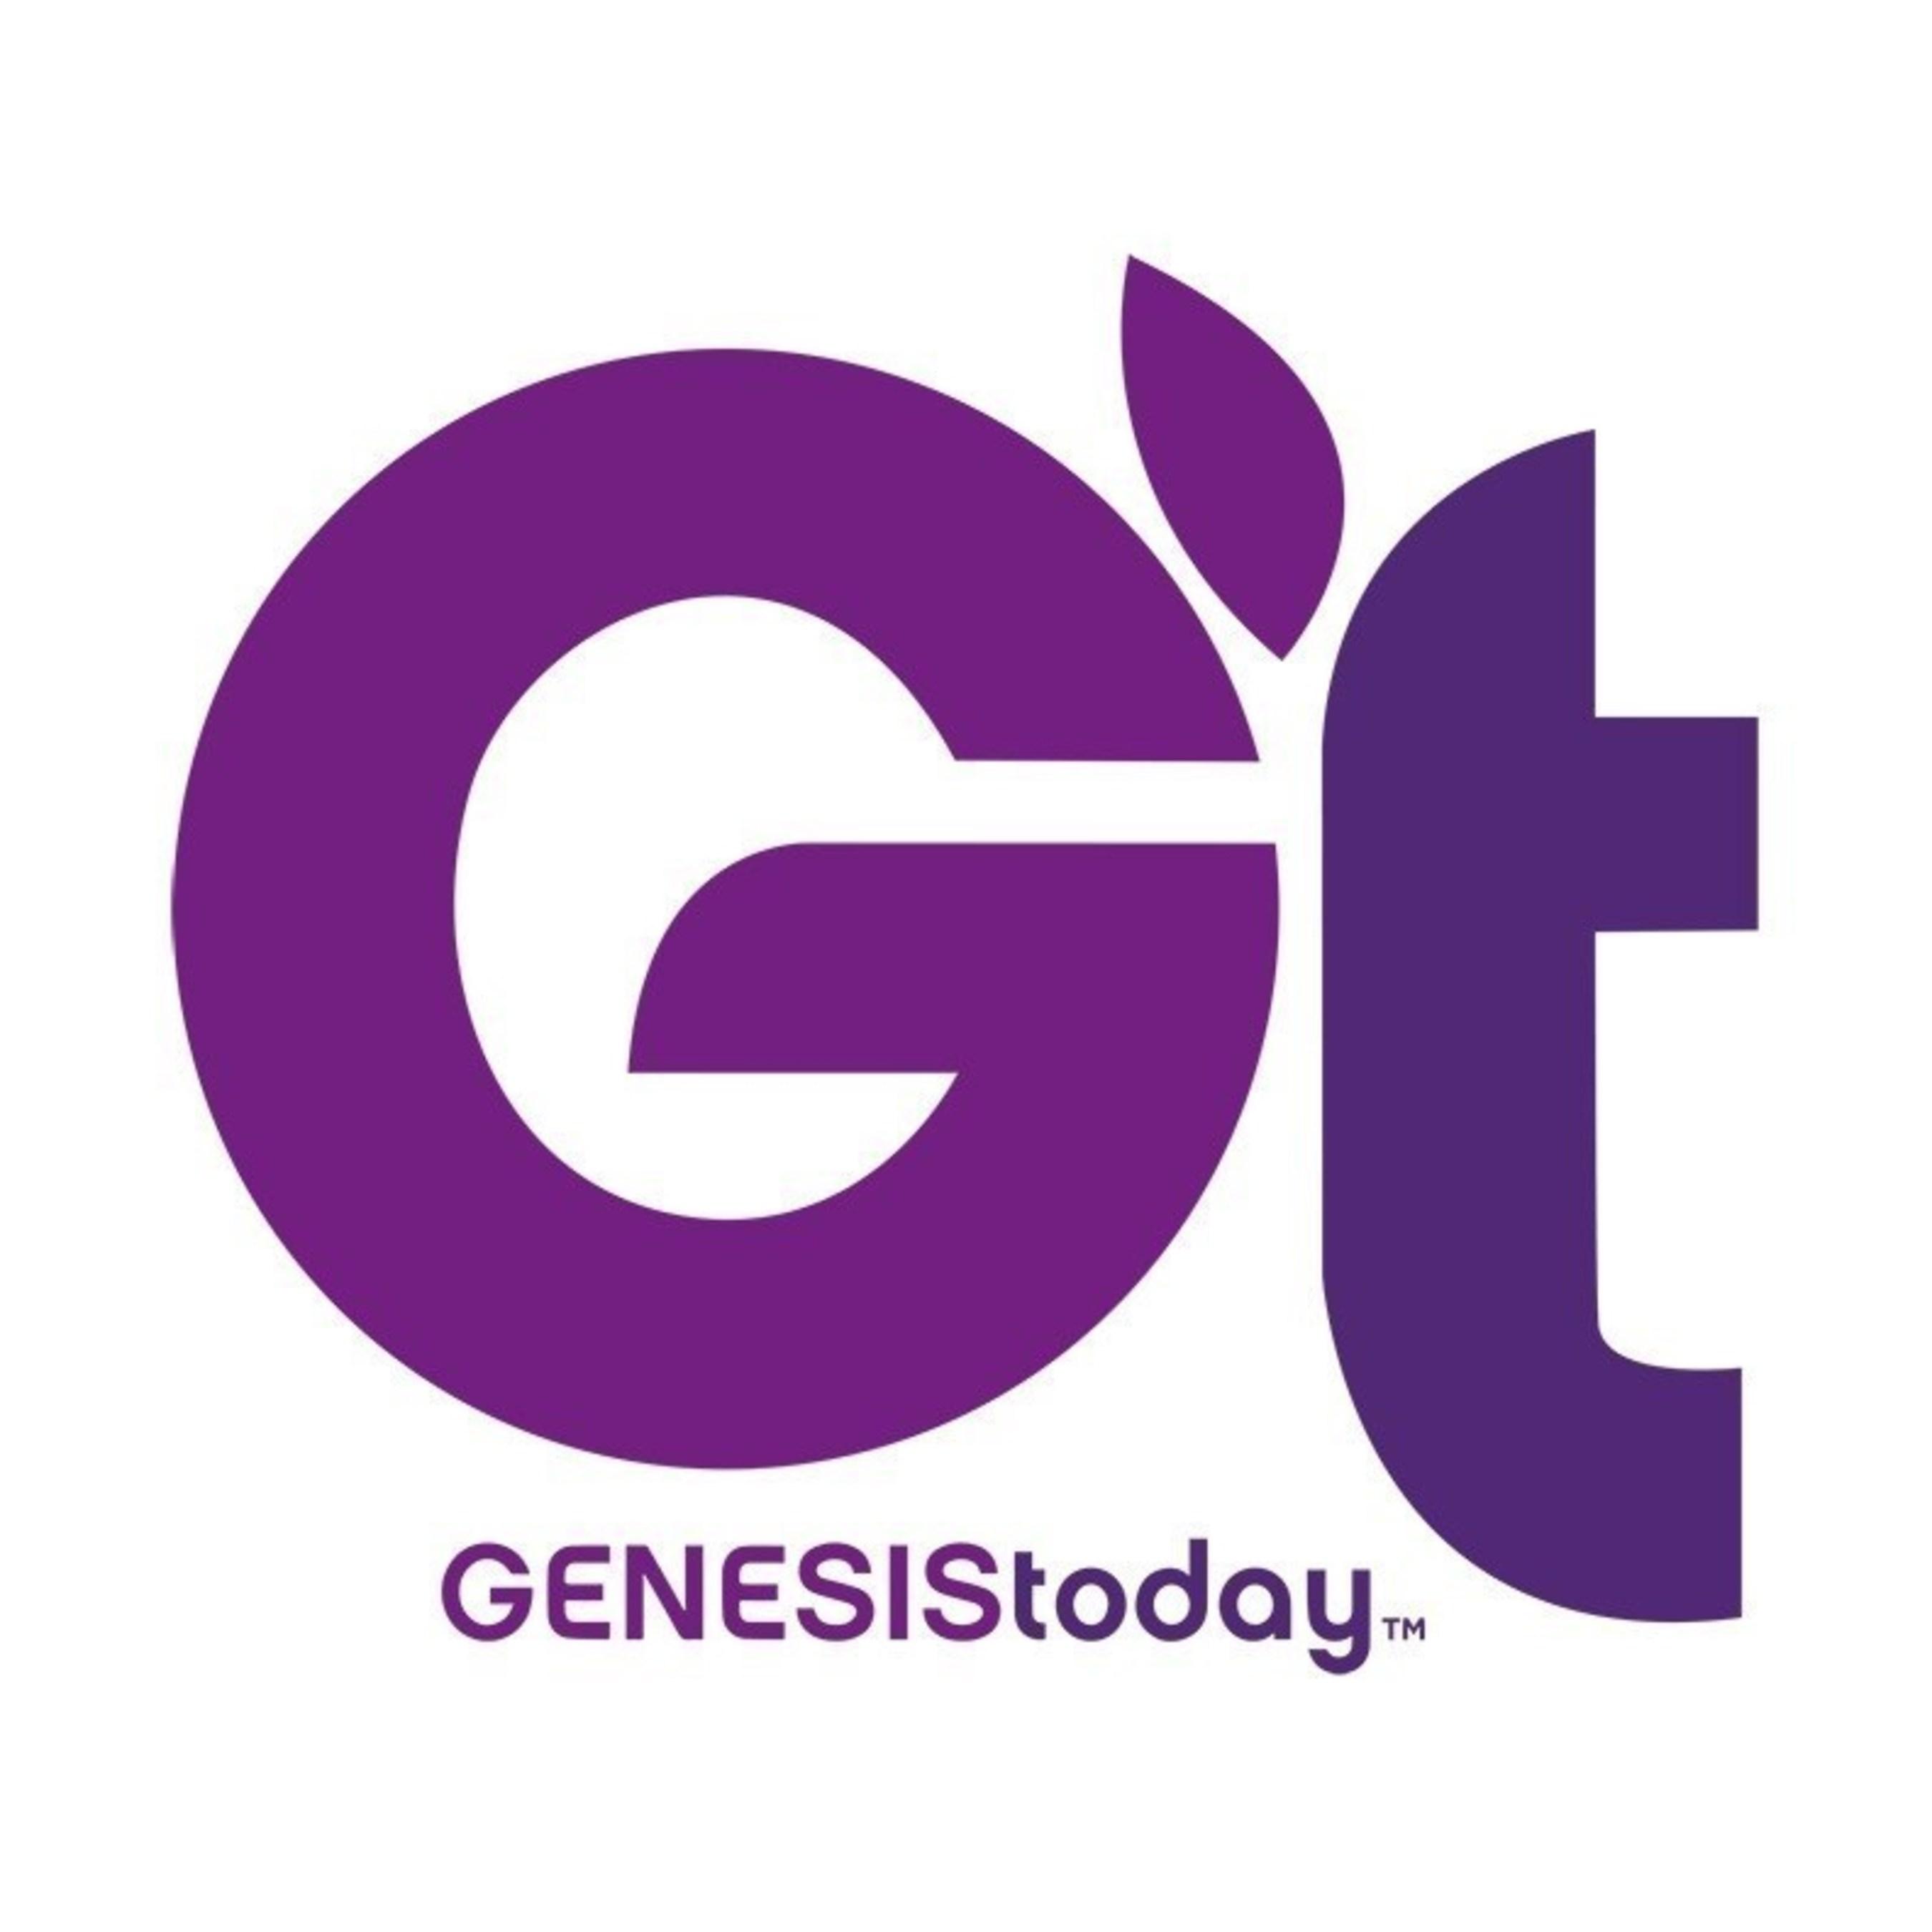 Genesis Today logo.